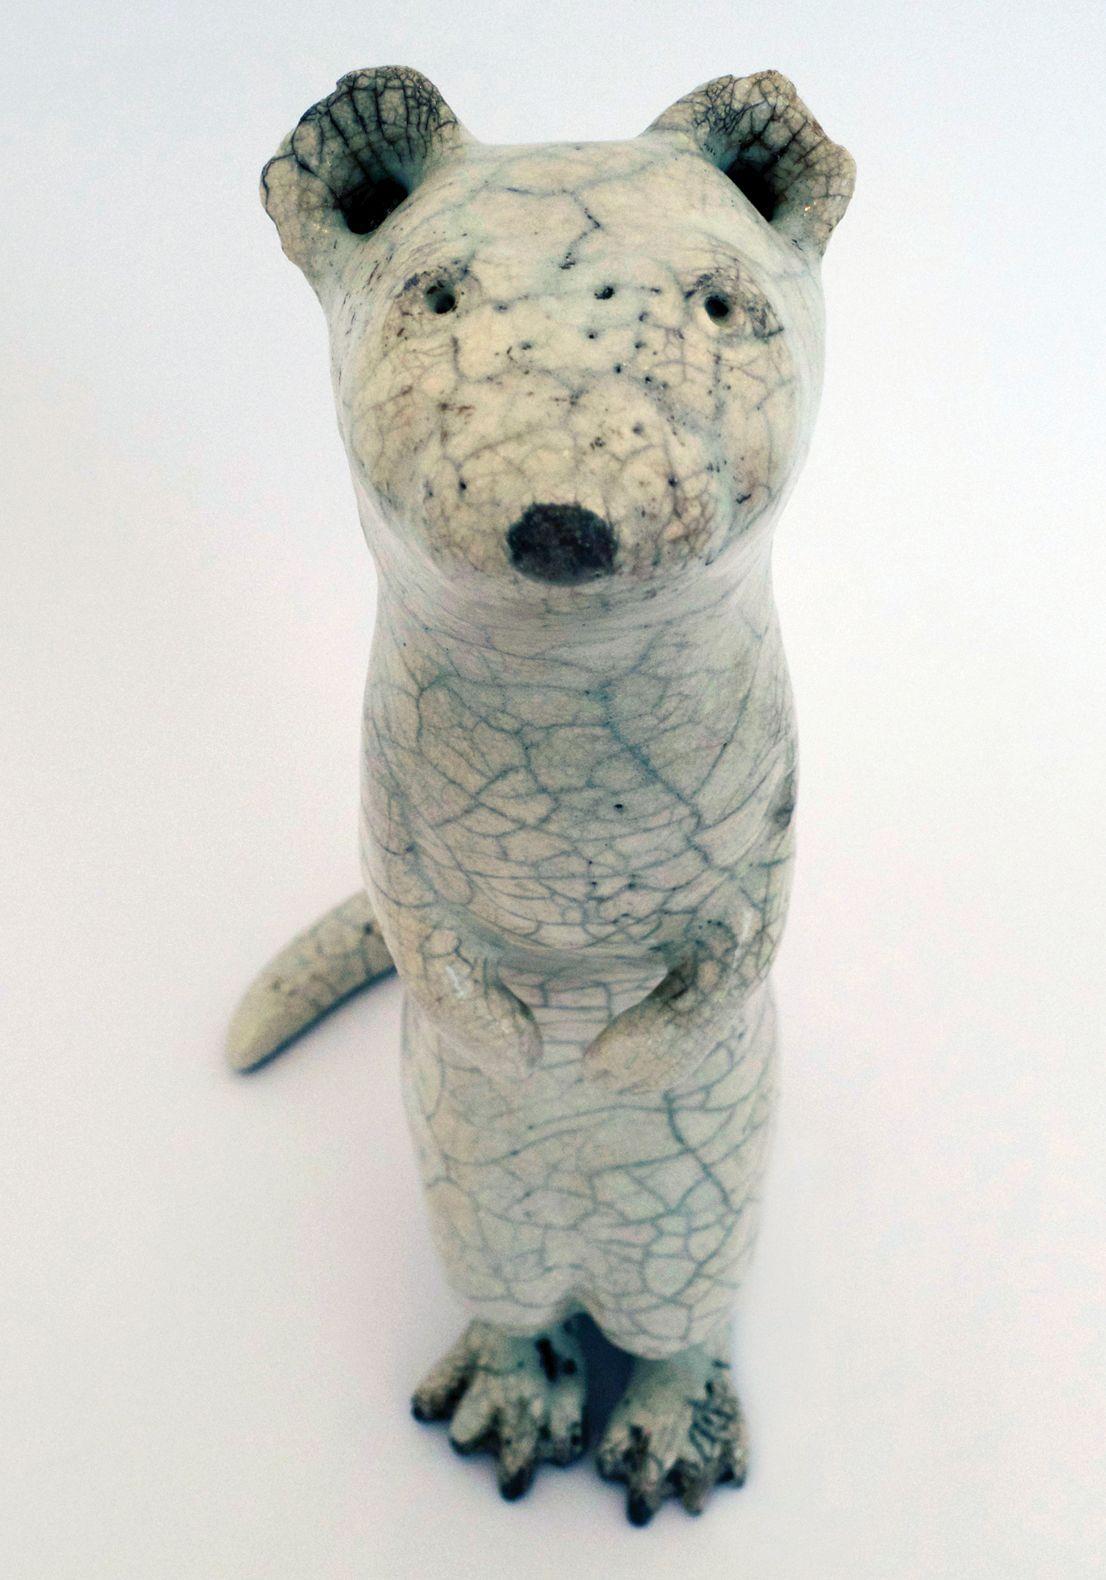 Anne Junsjö - Swedish ceramics artist. Anne is very versatile, does amazing dailyware, tea bowls and sculpture!